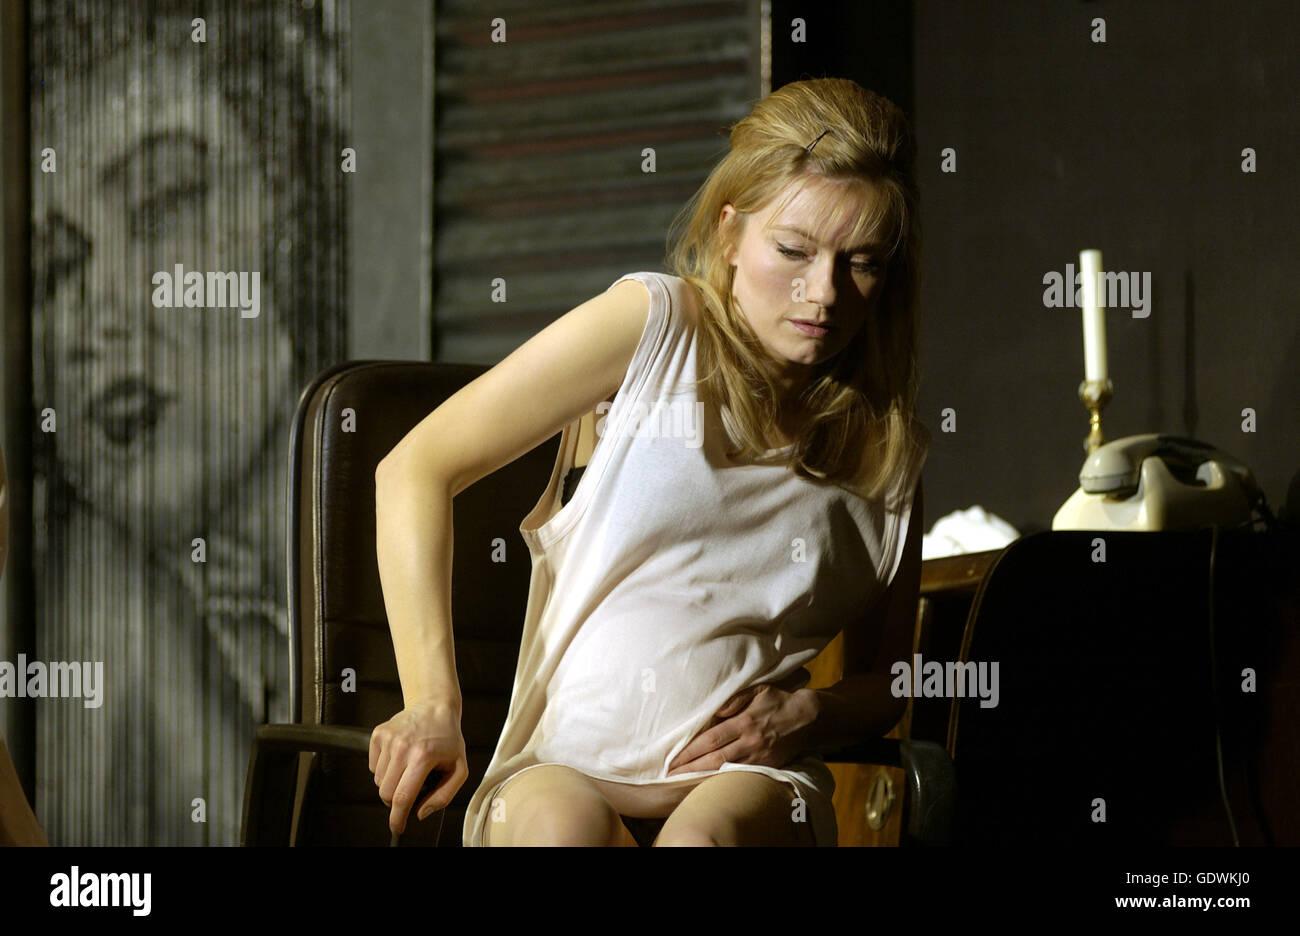 Johanna Christine Gehlen Stockfoto, Bild: 111816936 - Alamy